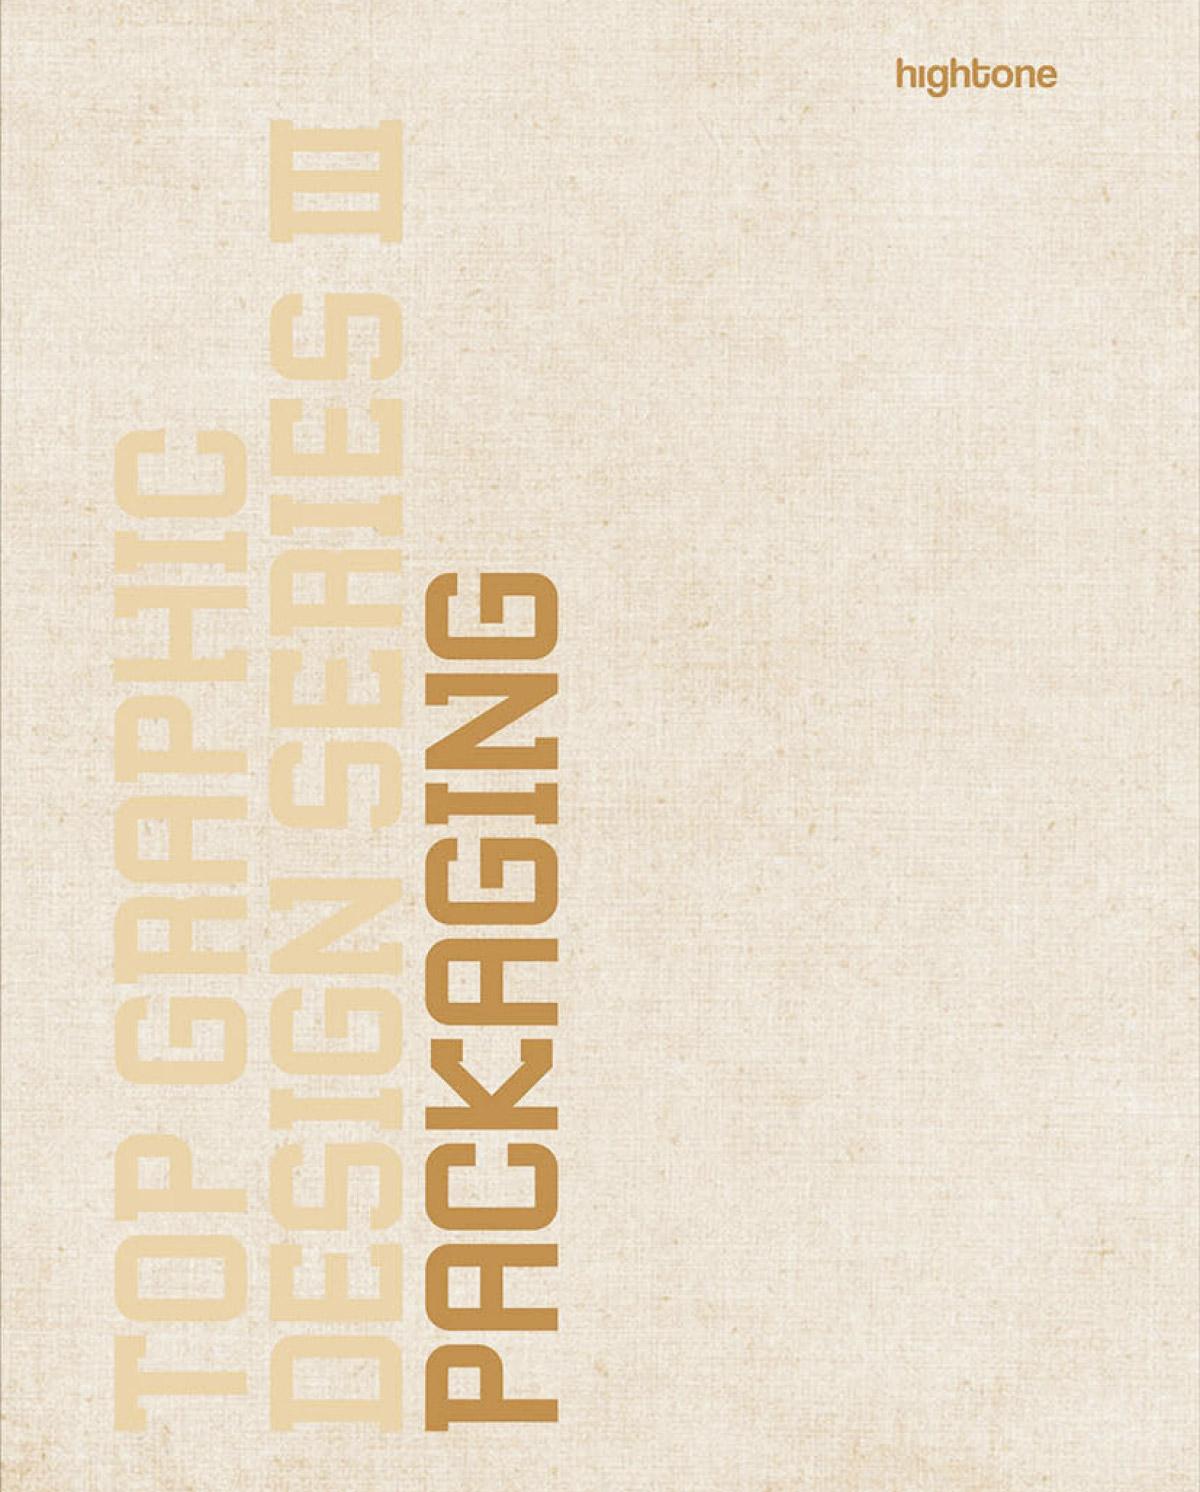 BRANCH_PRESS_TOP_PACKAGING_1